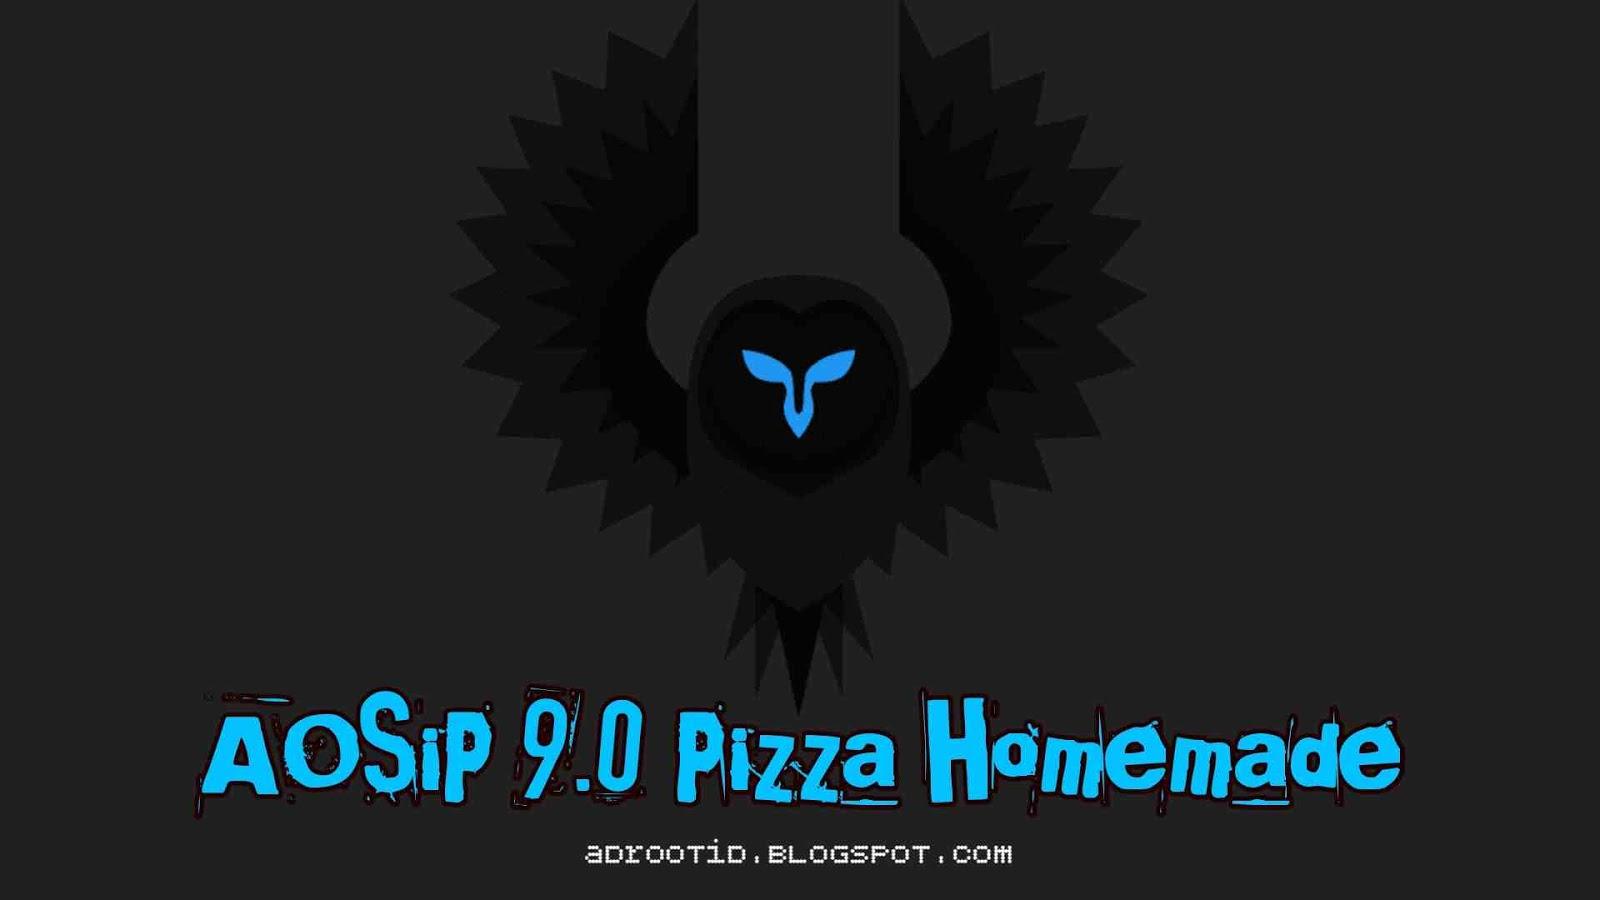 AOSIP Pizza Rom Redmi 4X